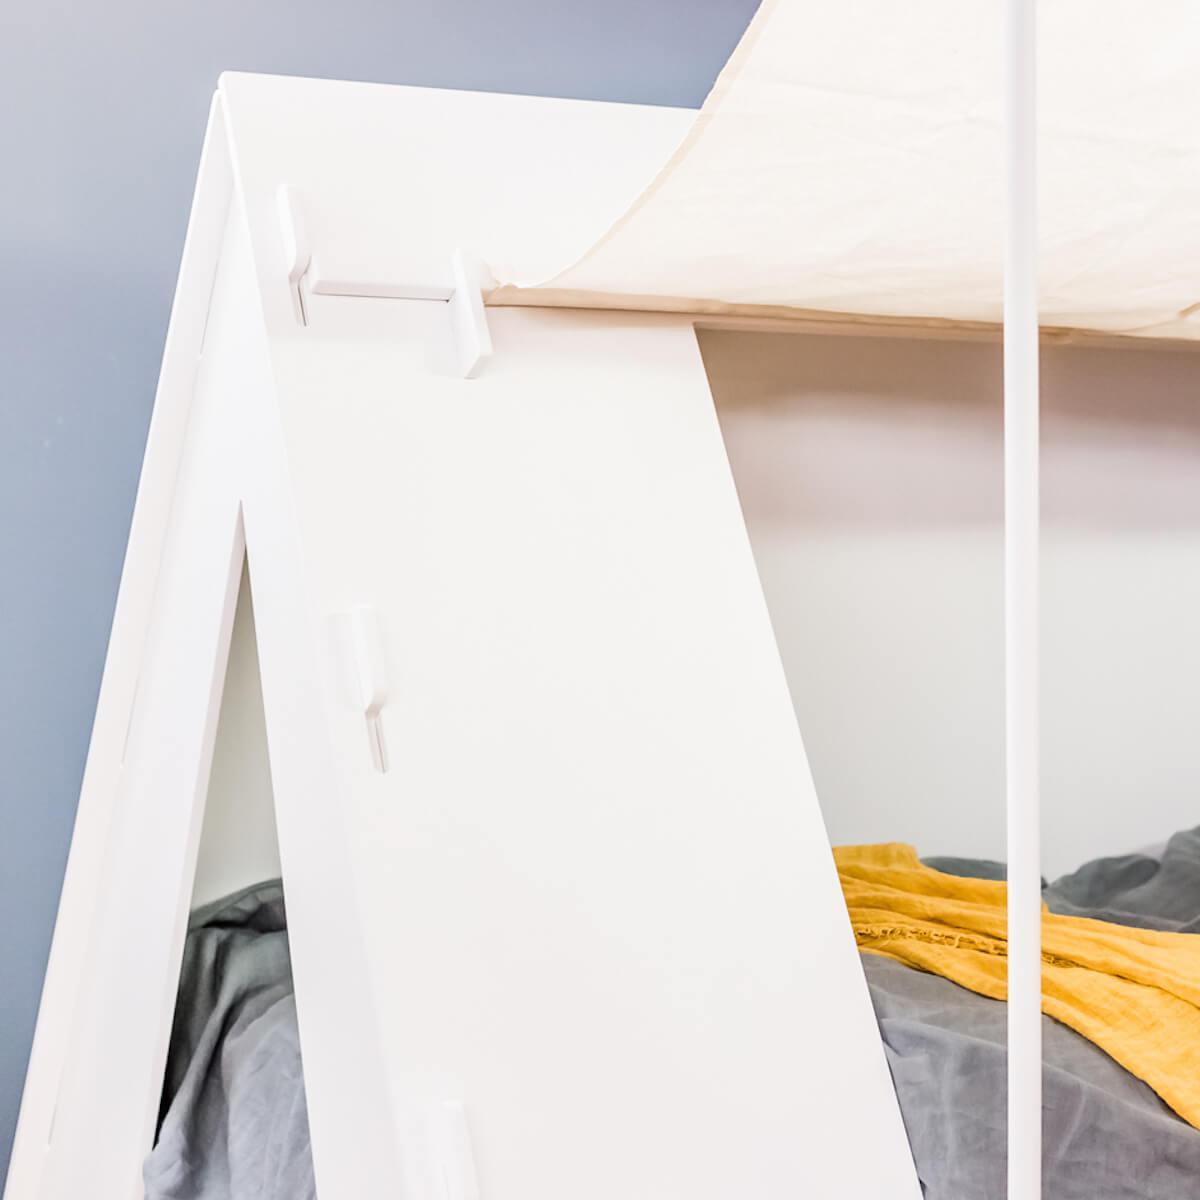 Lit bas-tiroir 90x200cm TENTE Mathy by Bols beige ivoire